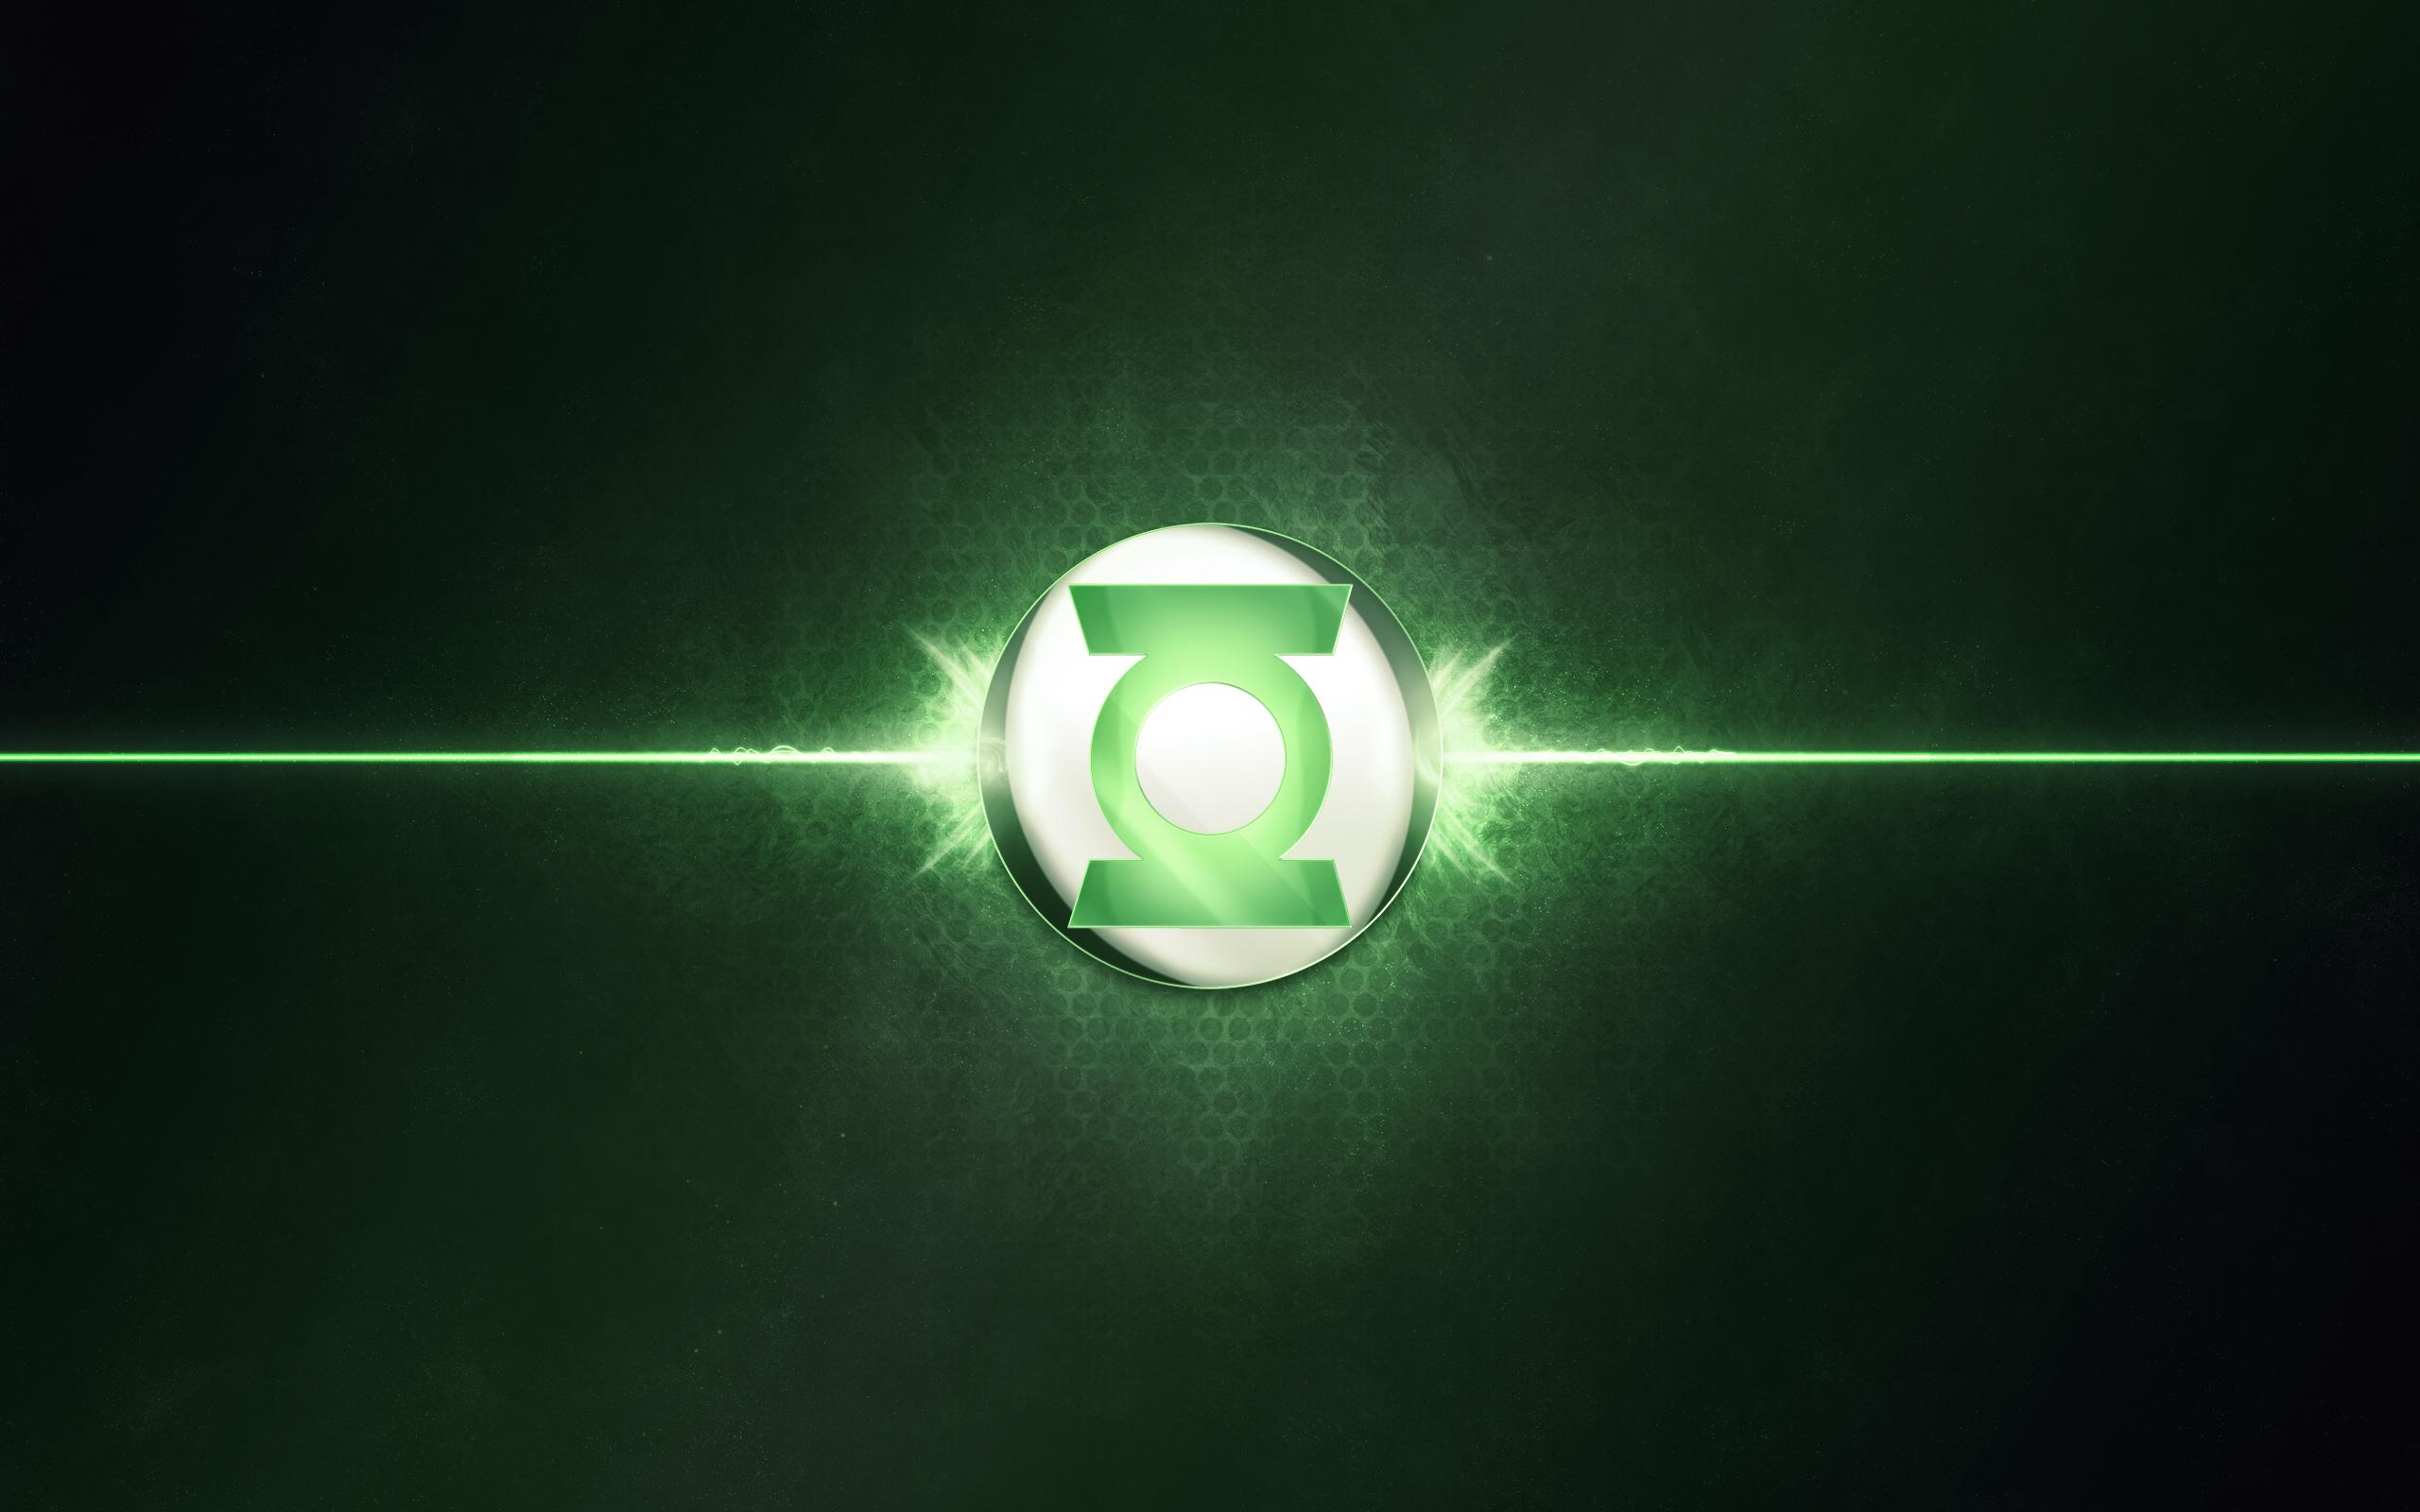 Lego Green Lantern Wallpaper Movies wallpaper set 7 2560x1600